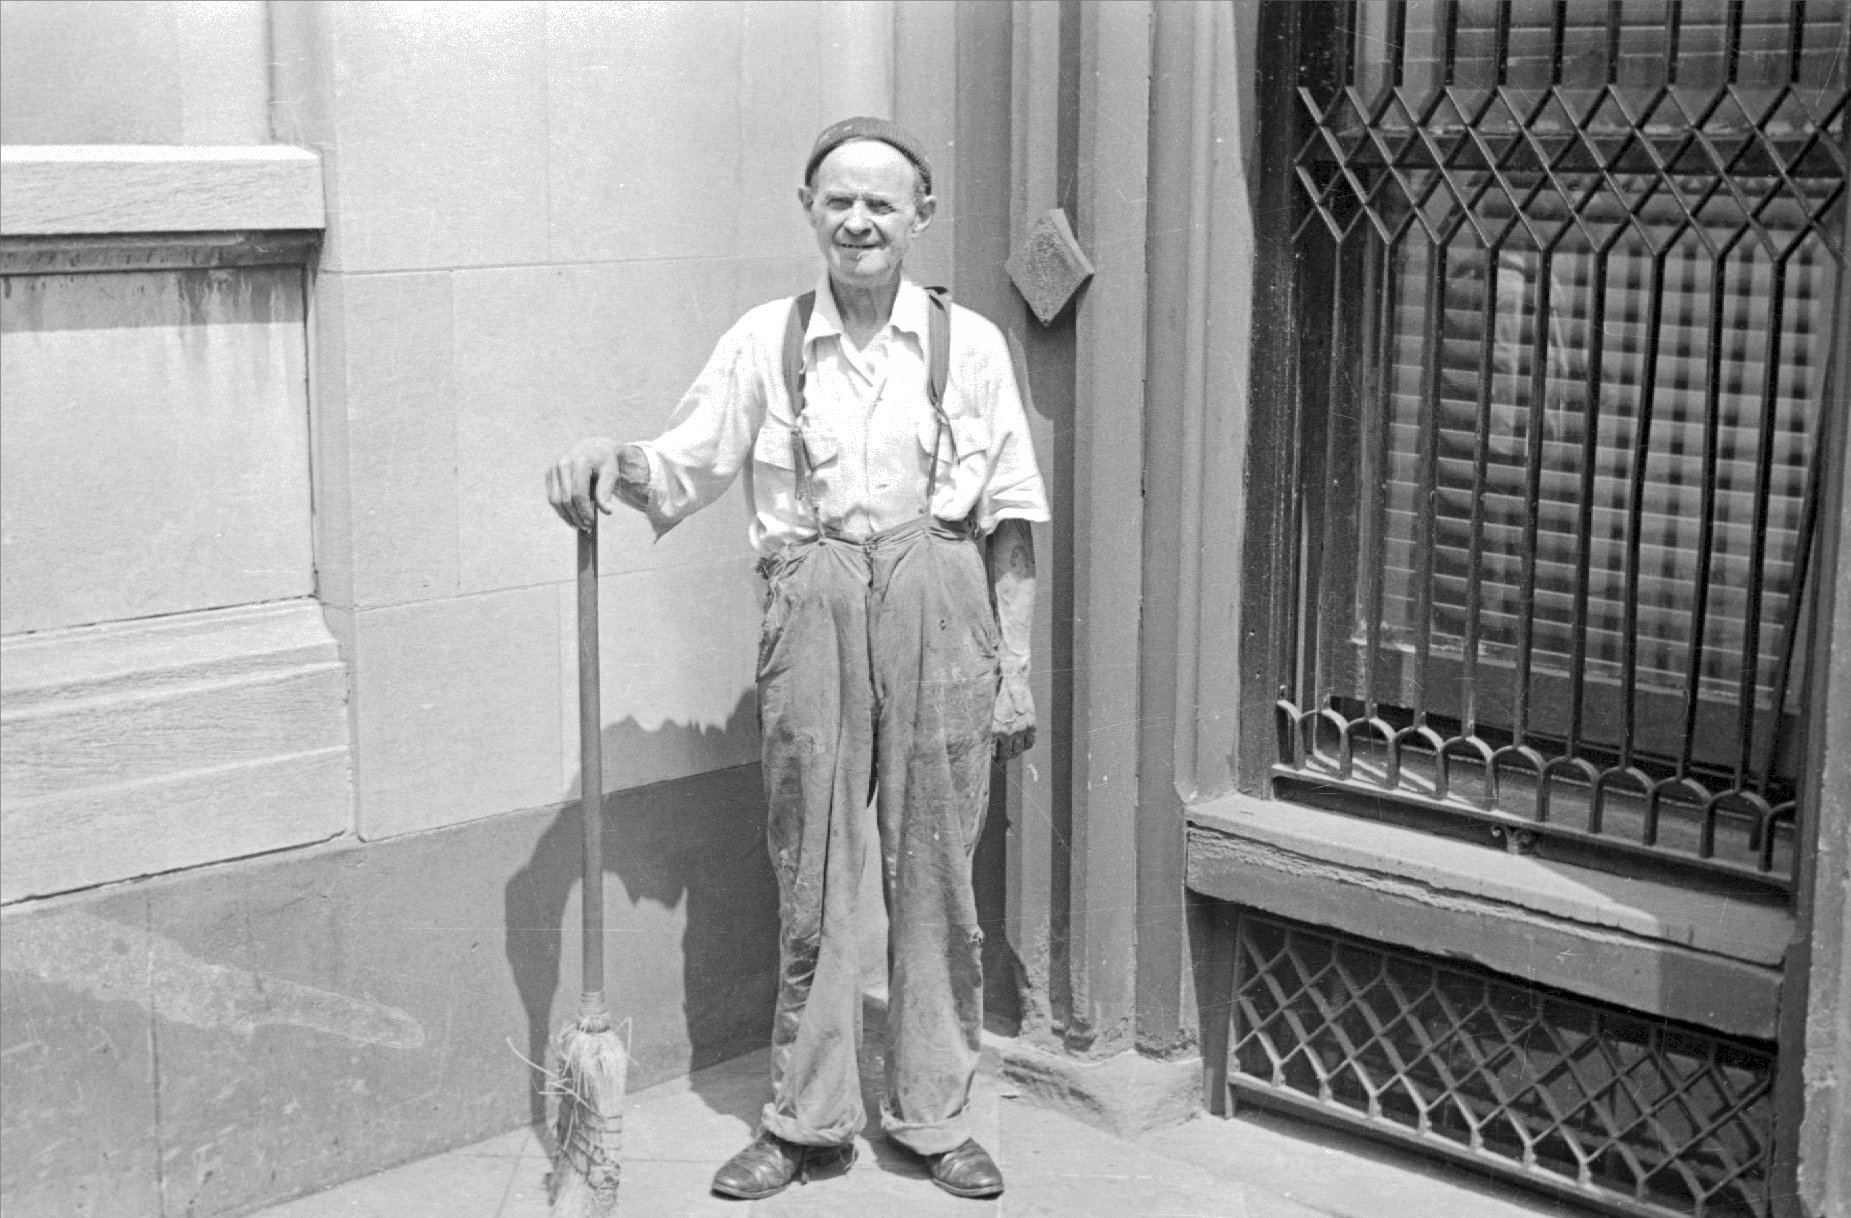 New York Sweeper 4